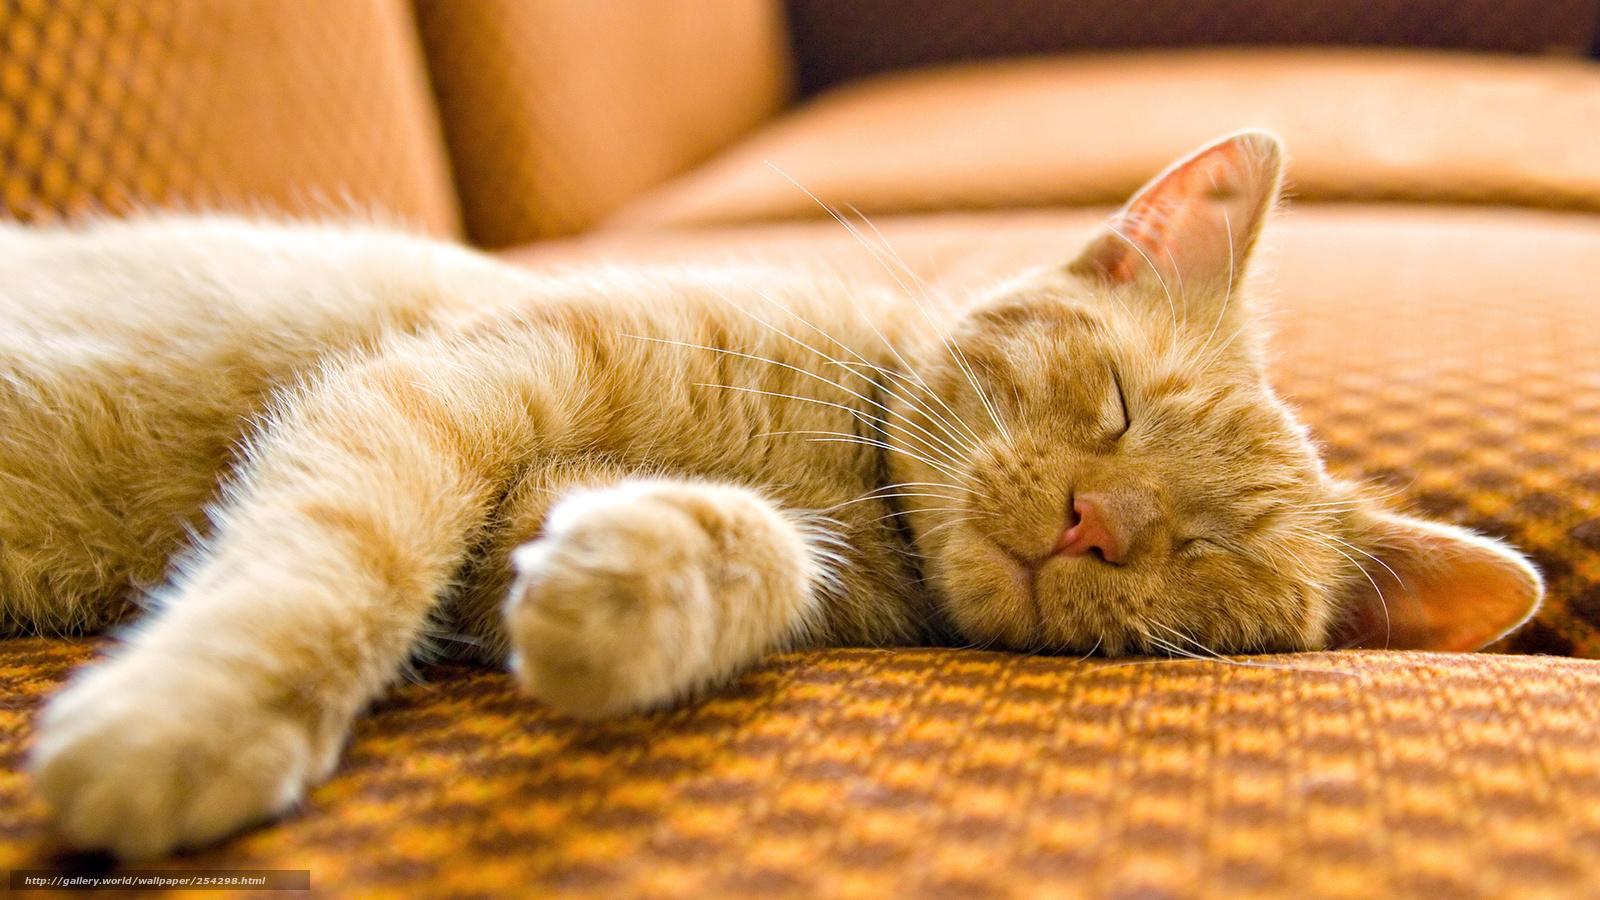 Толстуха спит на матрасе фото 16 фотография